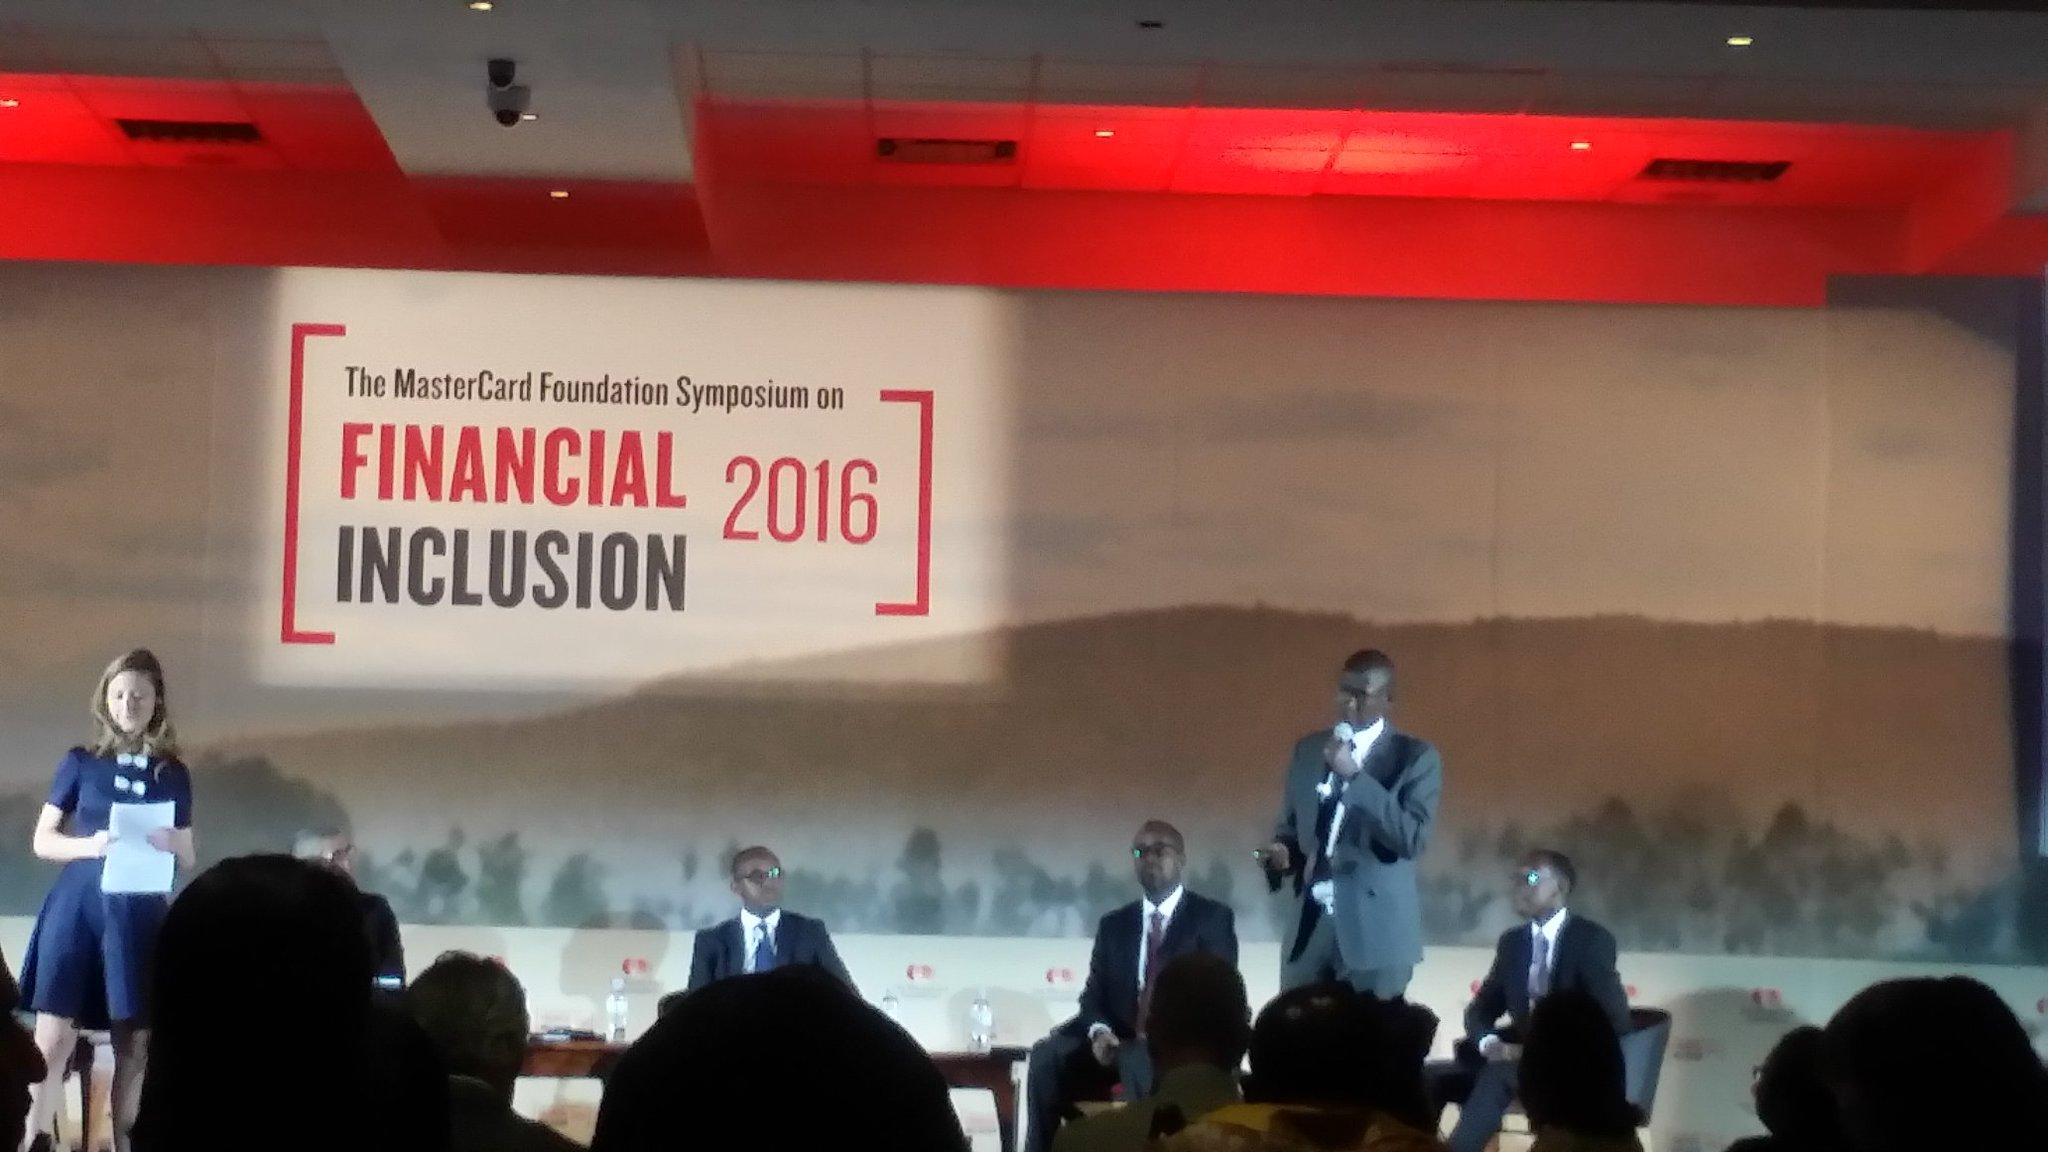 Mr.Murenzi telling us about the impressive financial inclusion achievements in Rwanda 89% included #BNR #sofi2016 https://t.co/2E5F7vTcSE